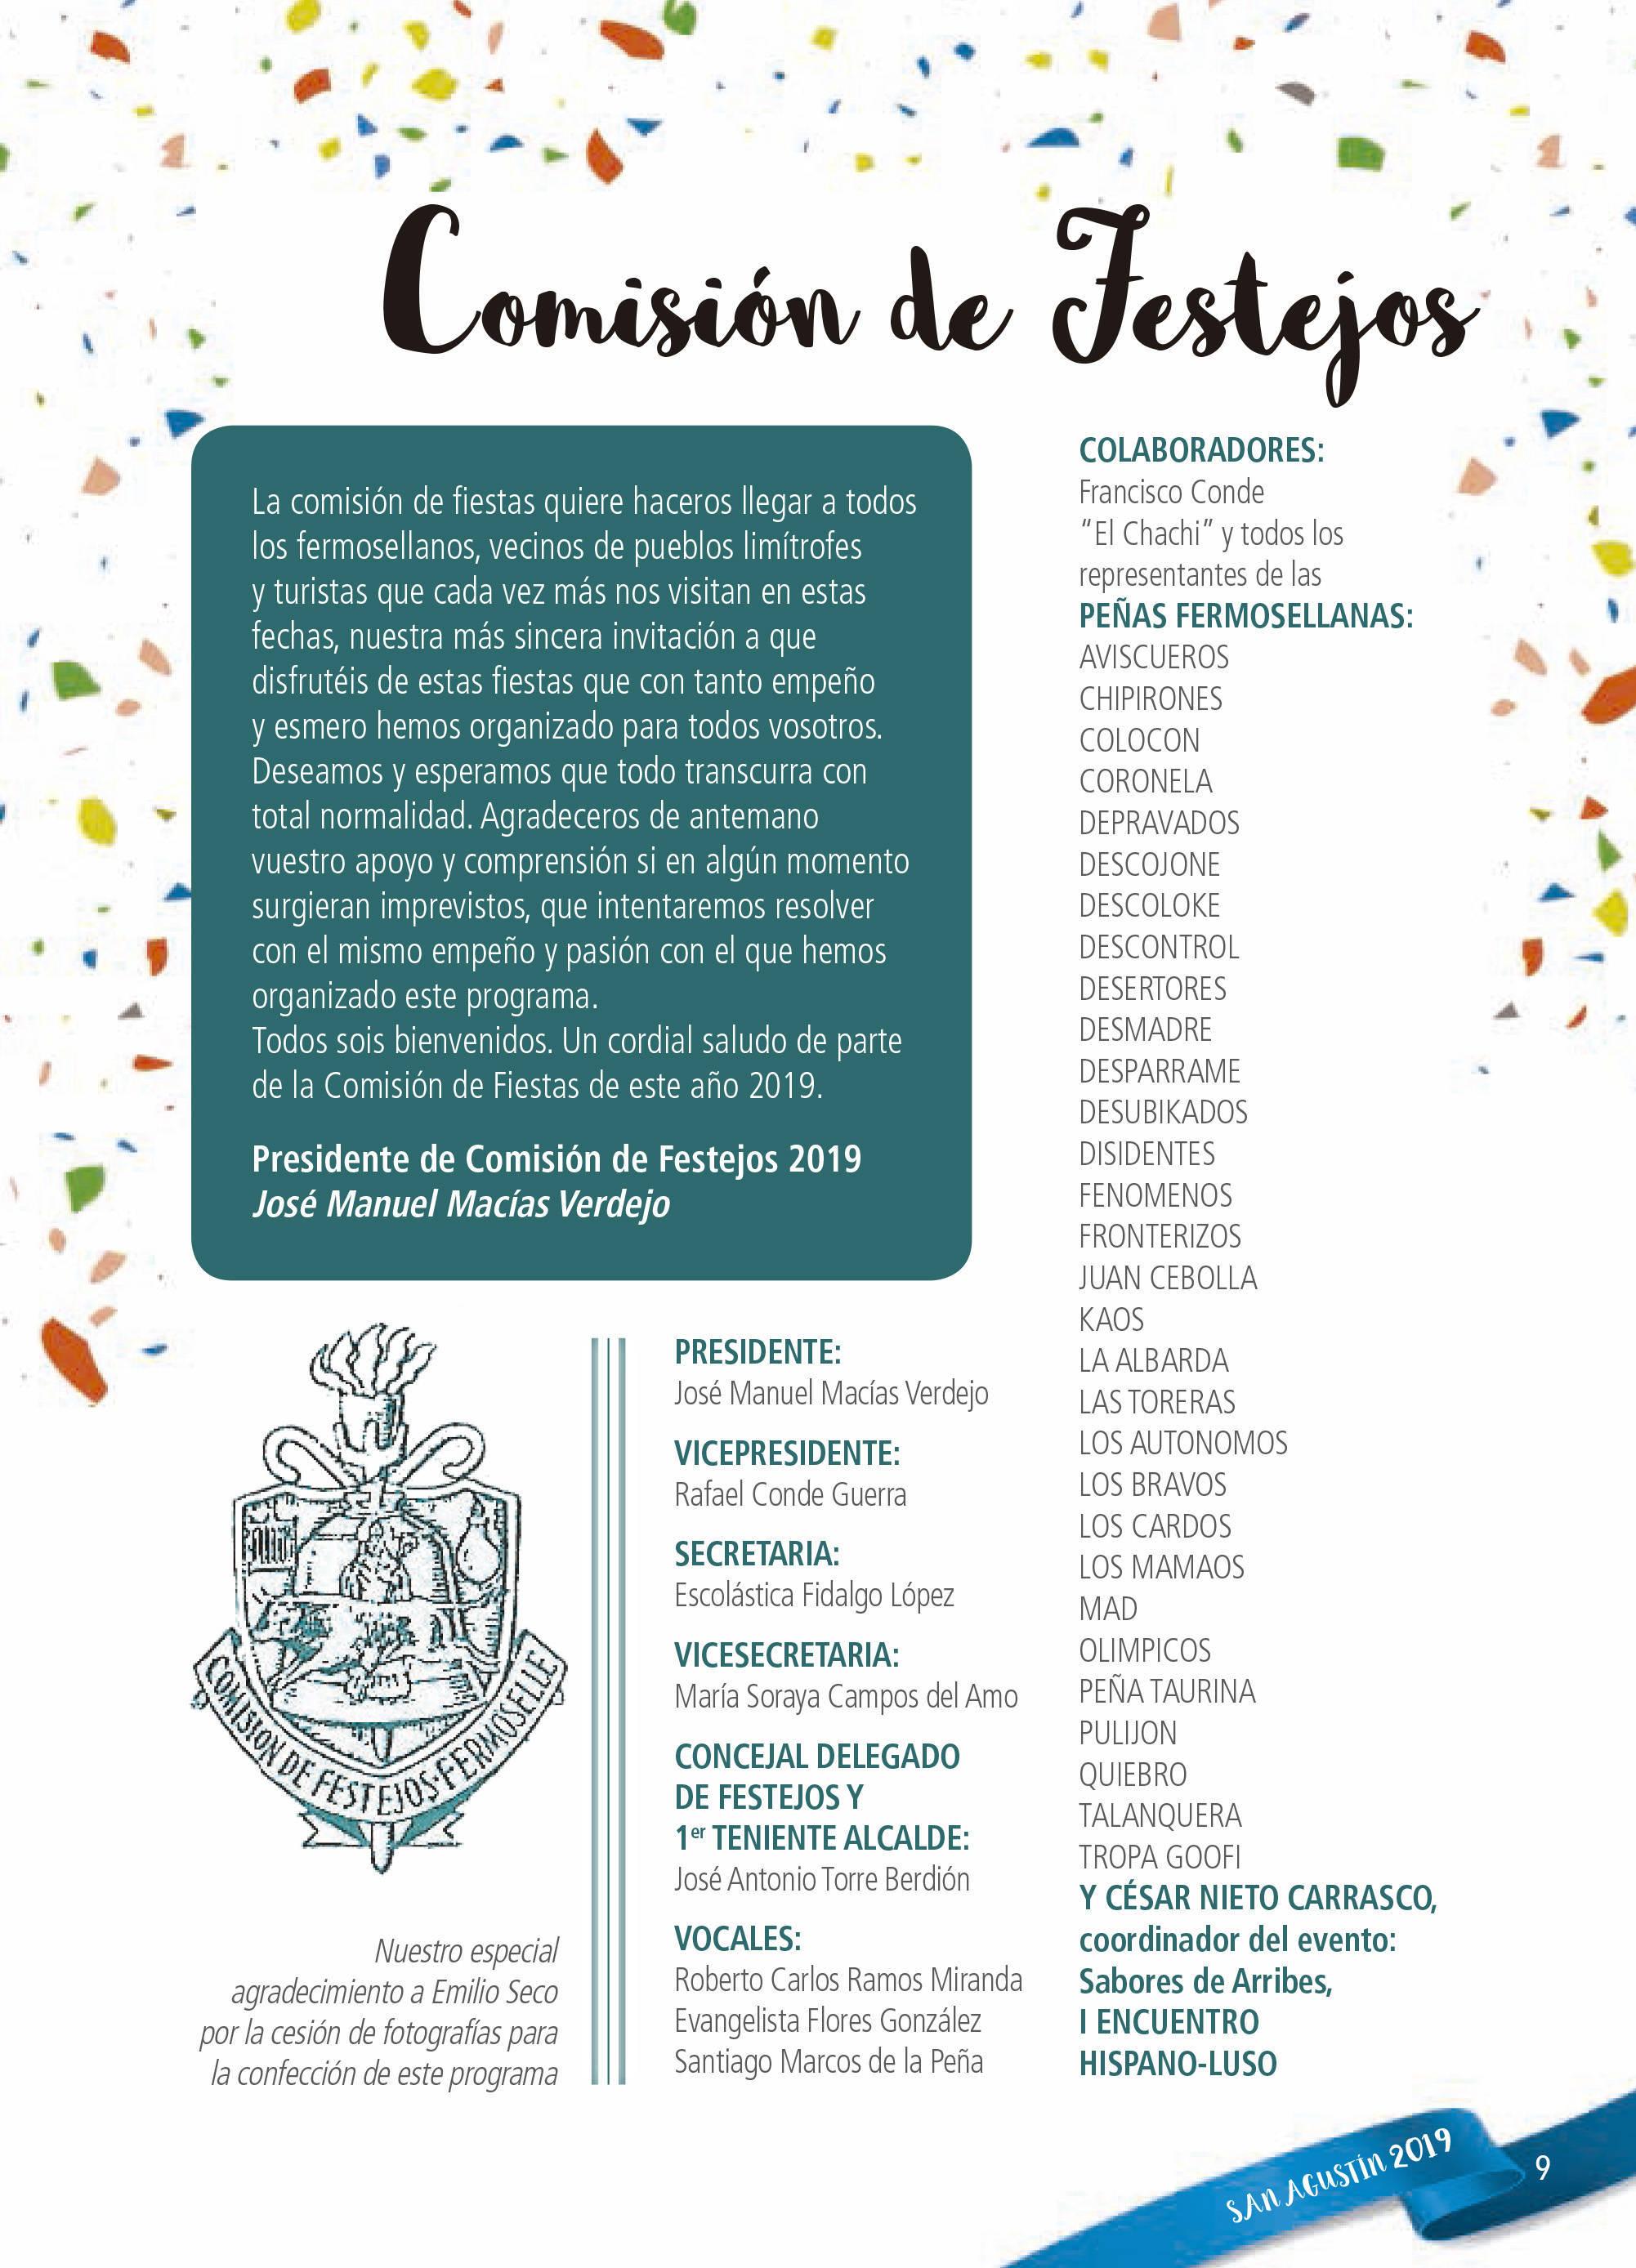 Programa de ferias y fiestas 2019 - Fermoselle (Zamora) 4